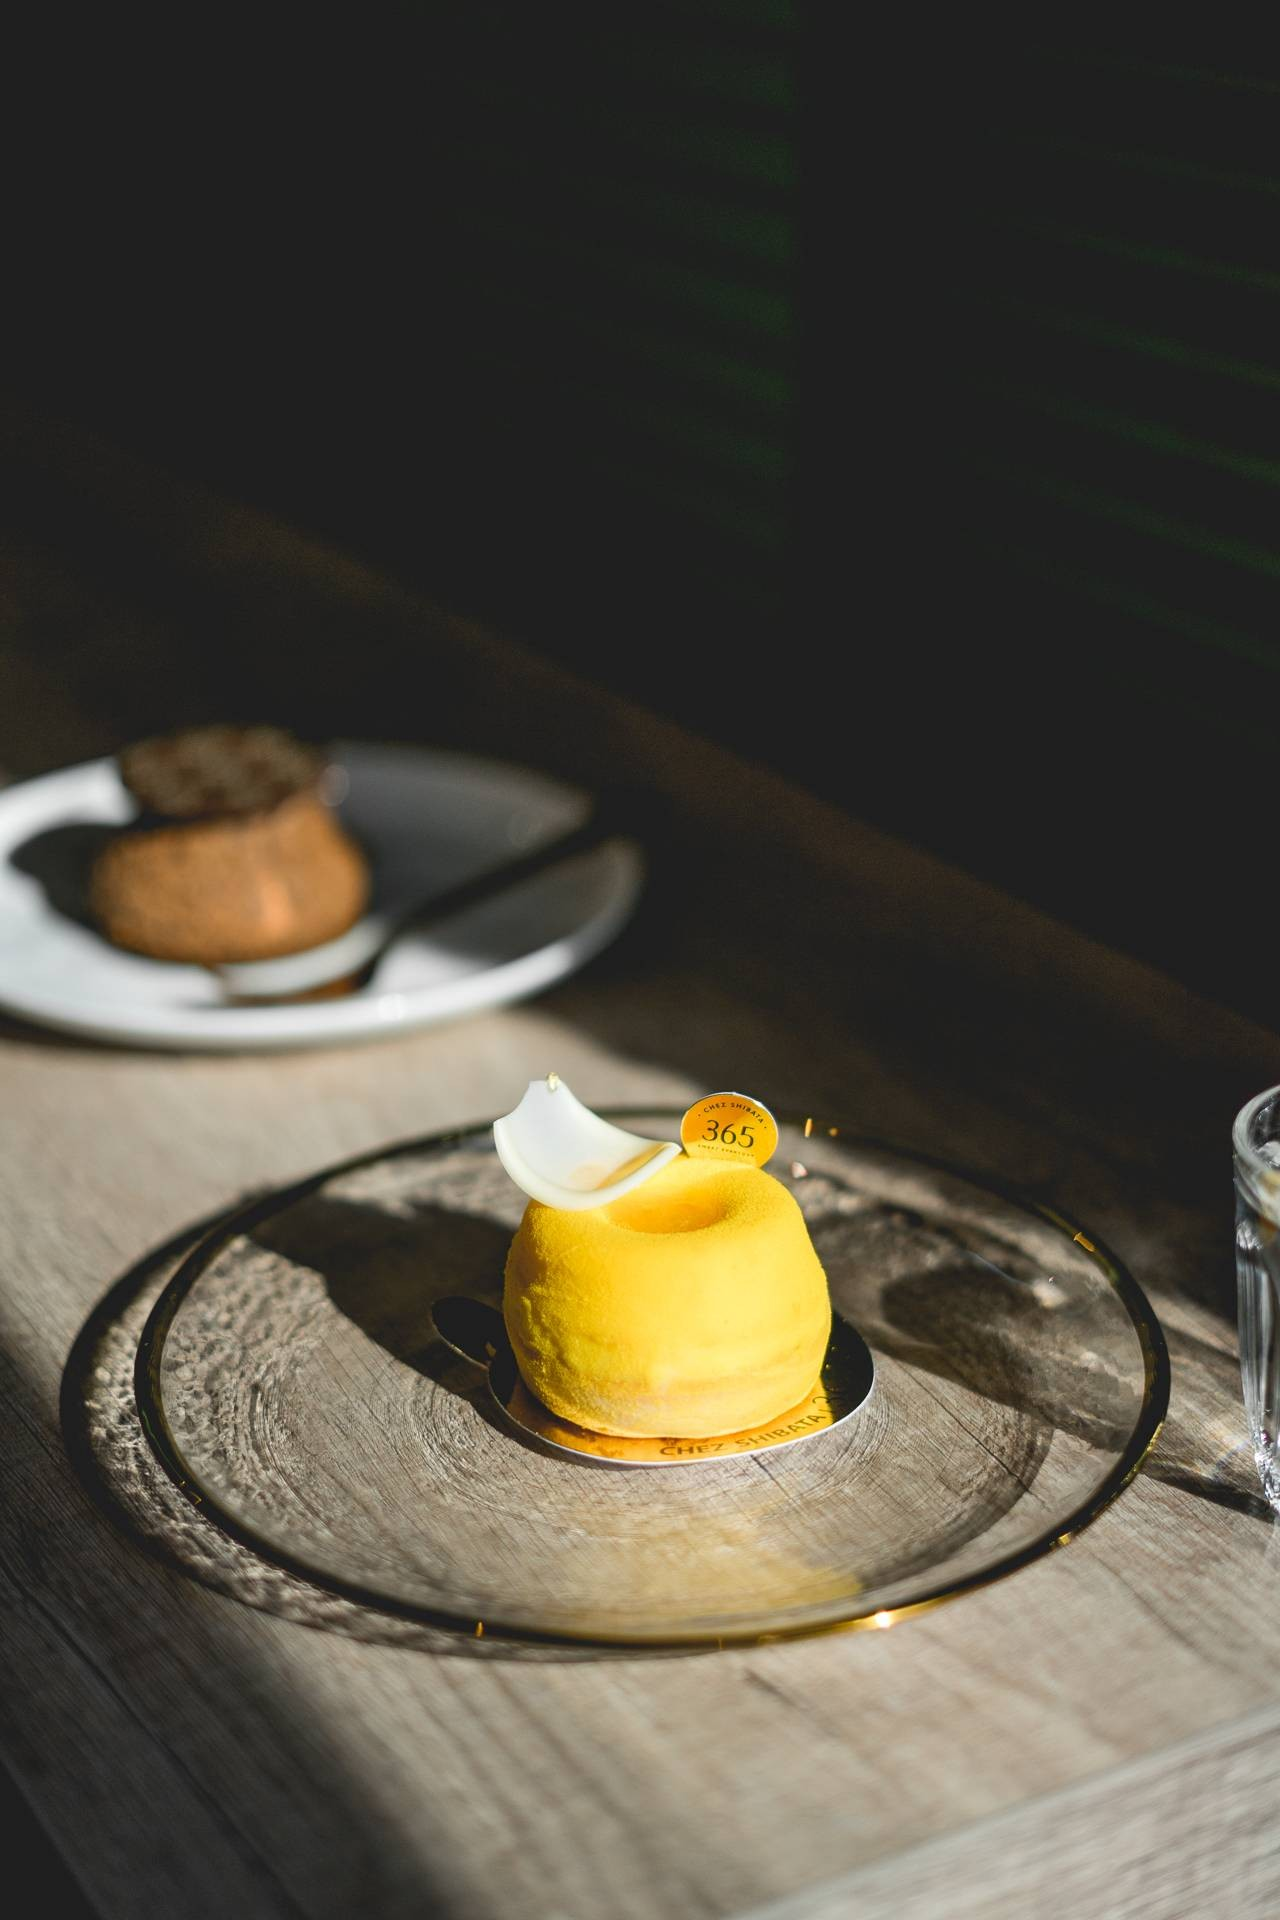 CHEZ SHIBATA 365 @Hotel Nikko Bangkok กินซ่า ทองหล่อ